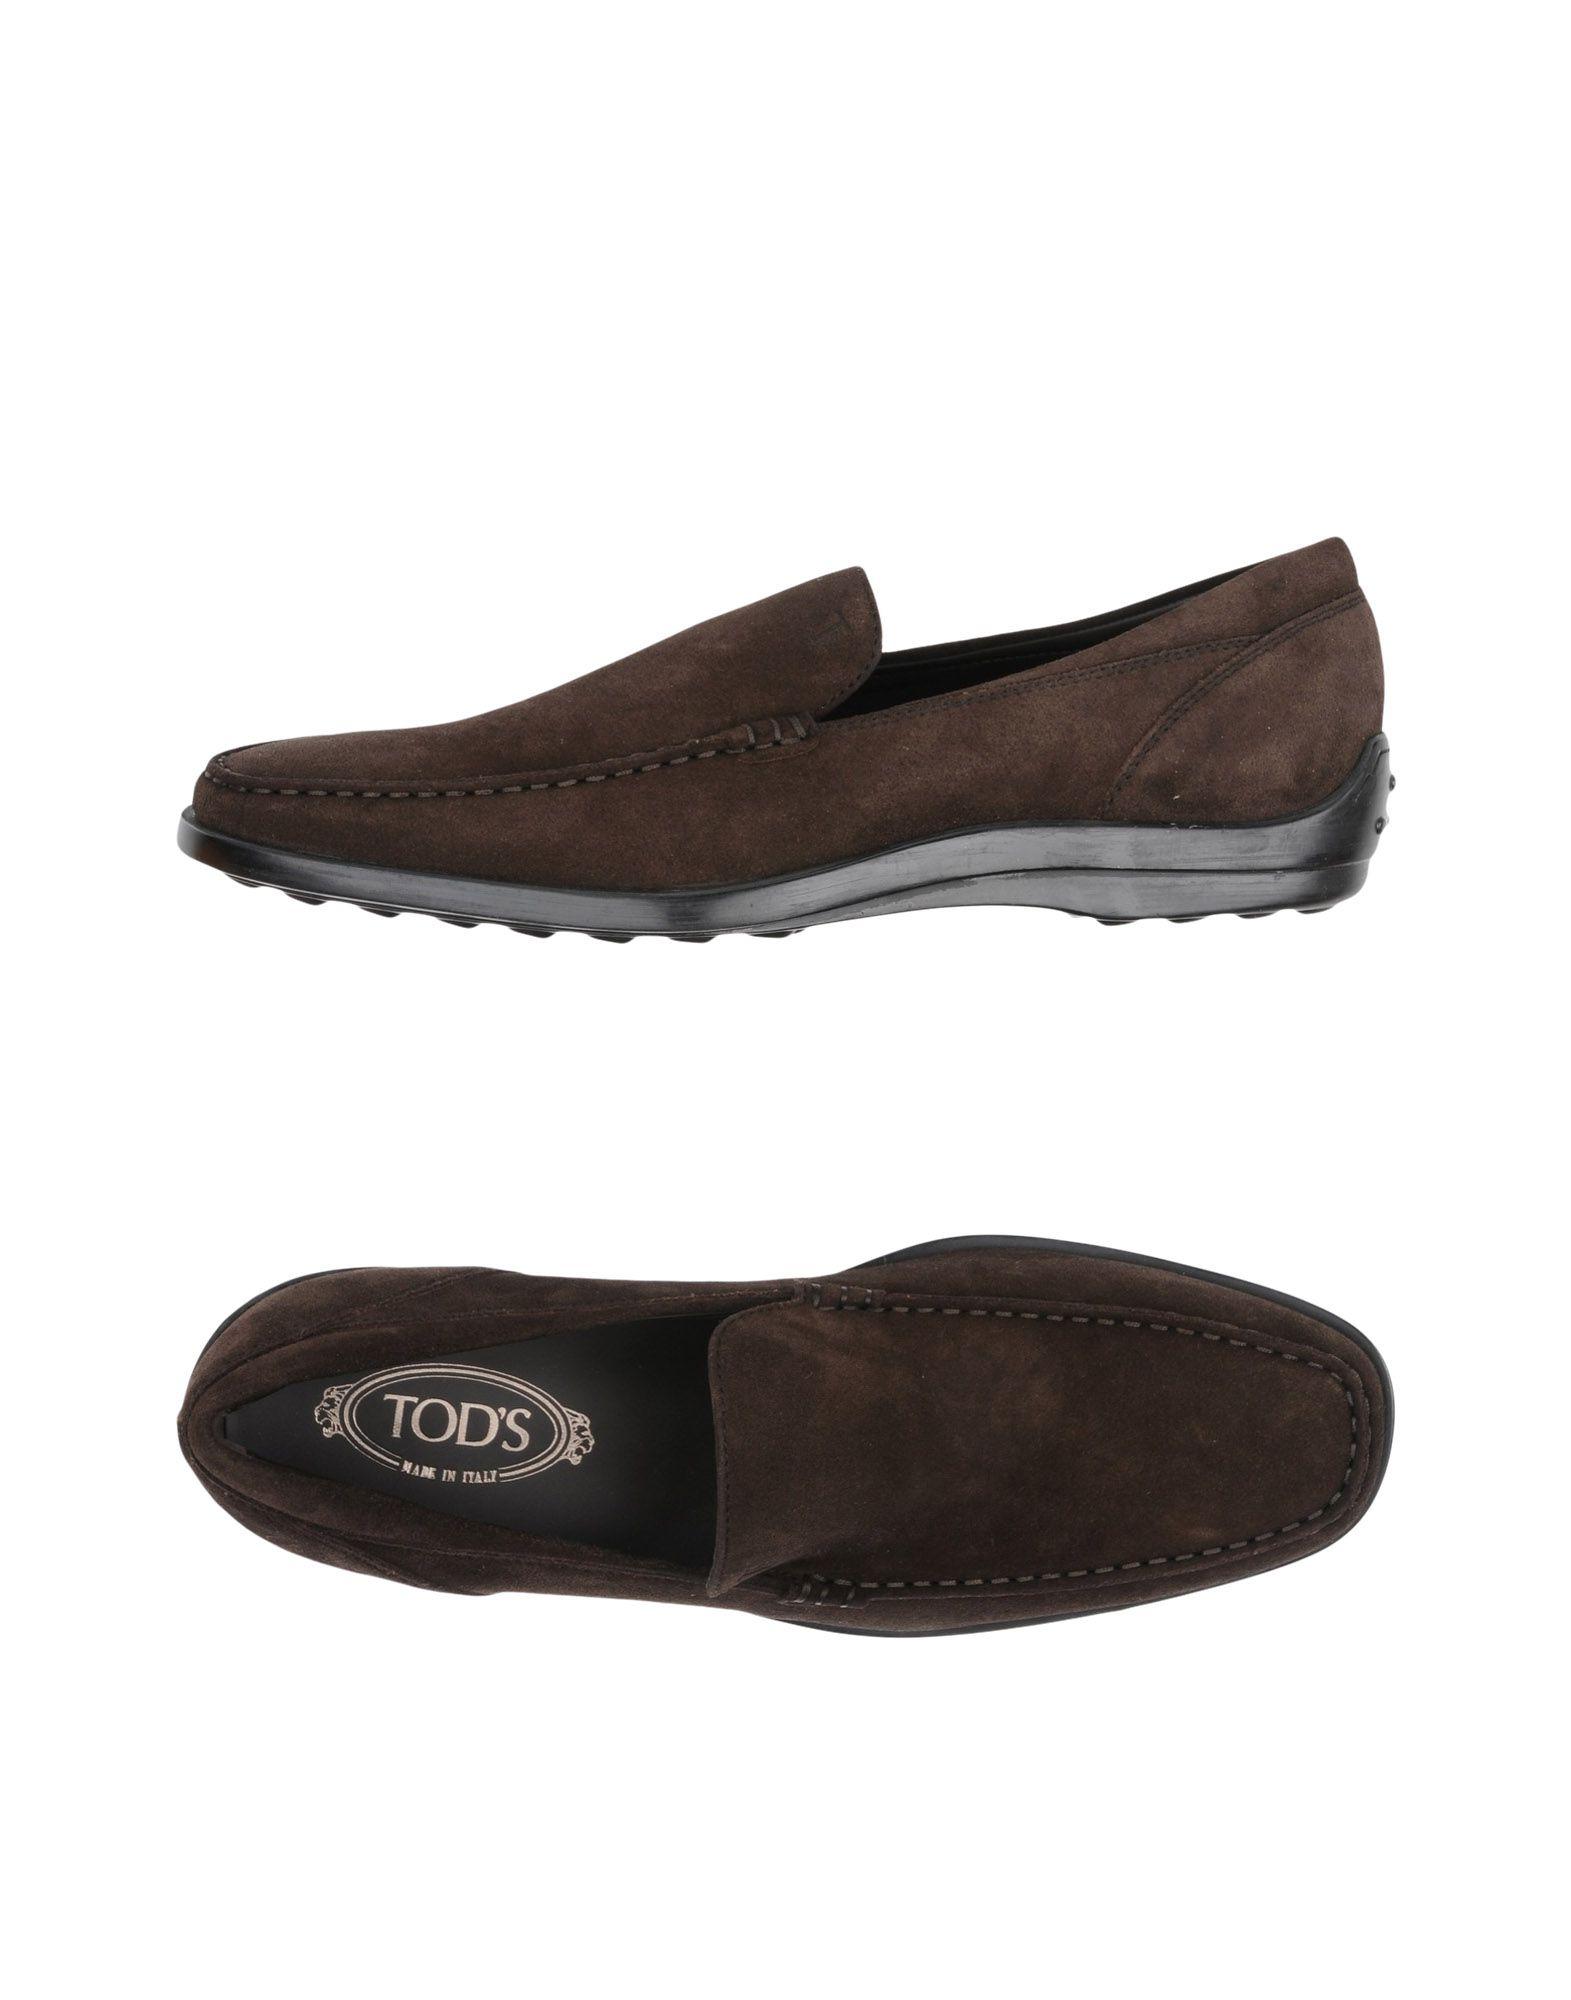 Tod's Mokassins Herren  11242579SE Gute Qualität beliebte Schuhe